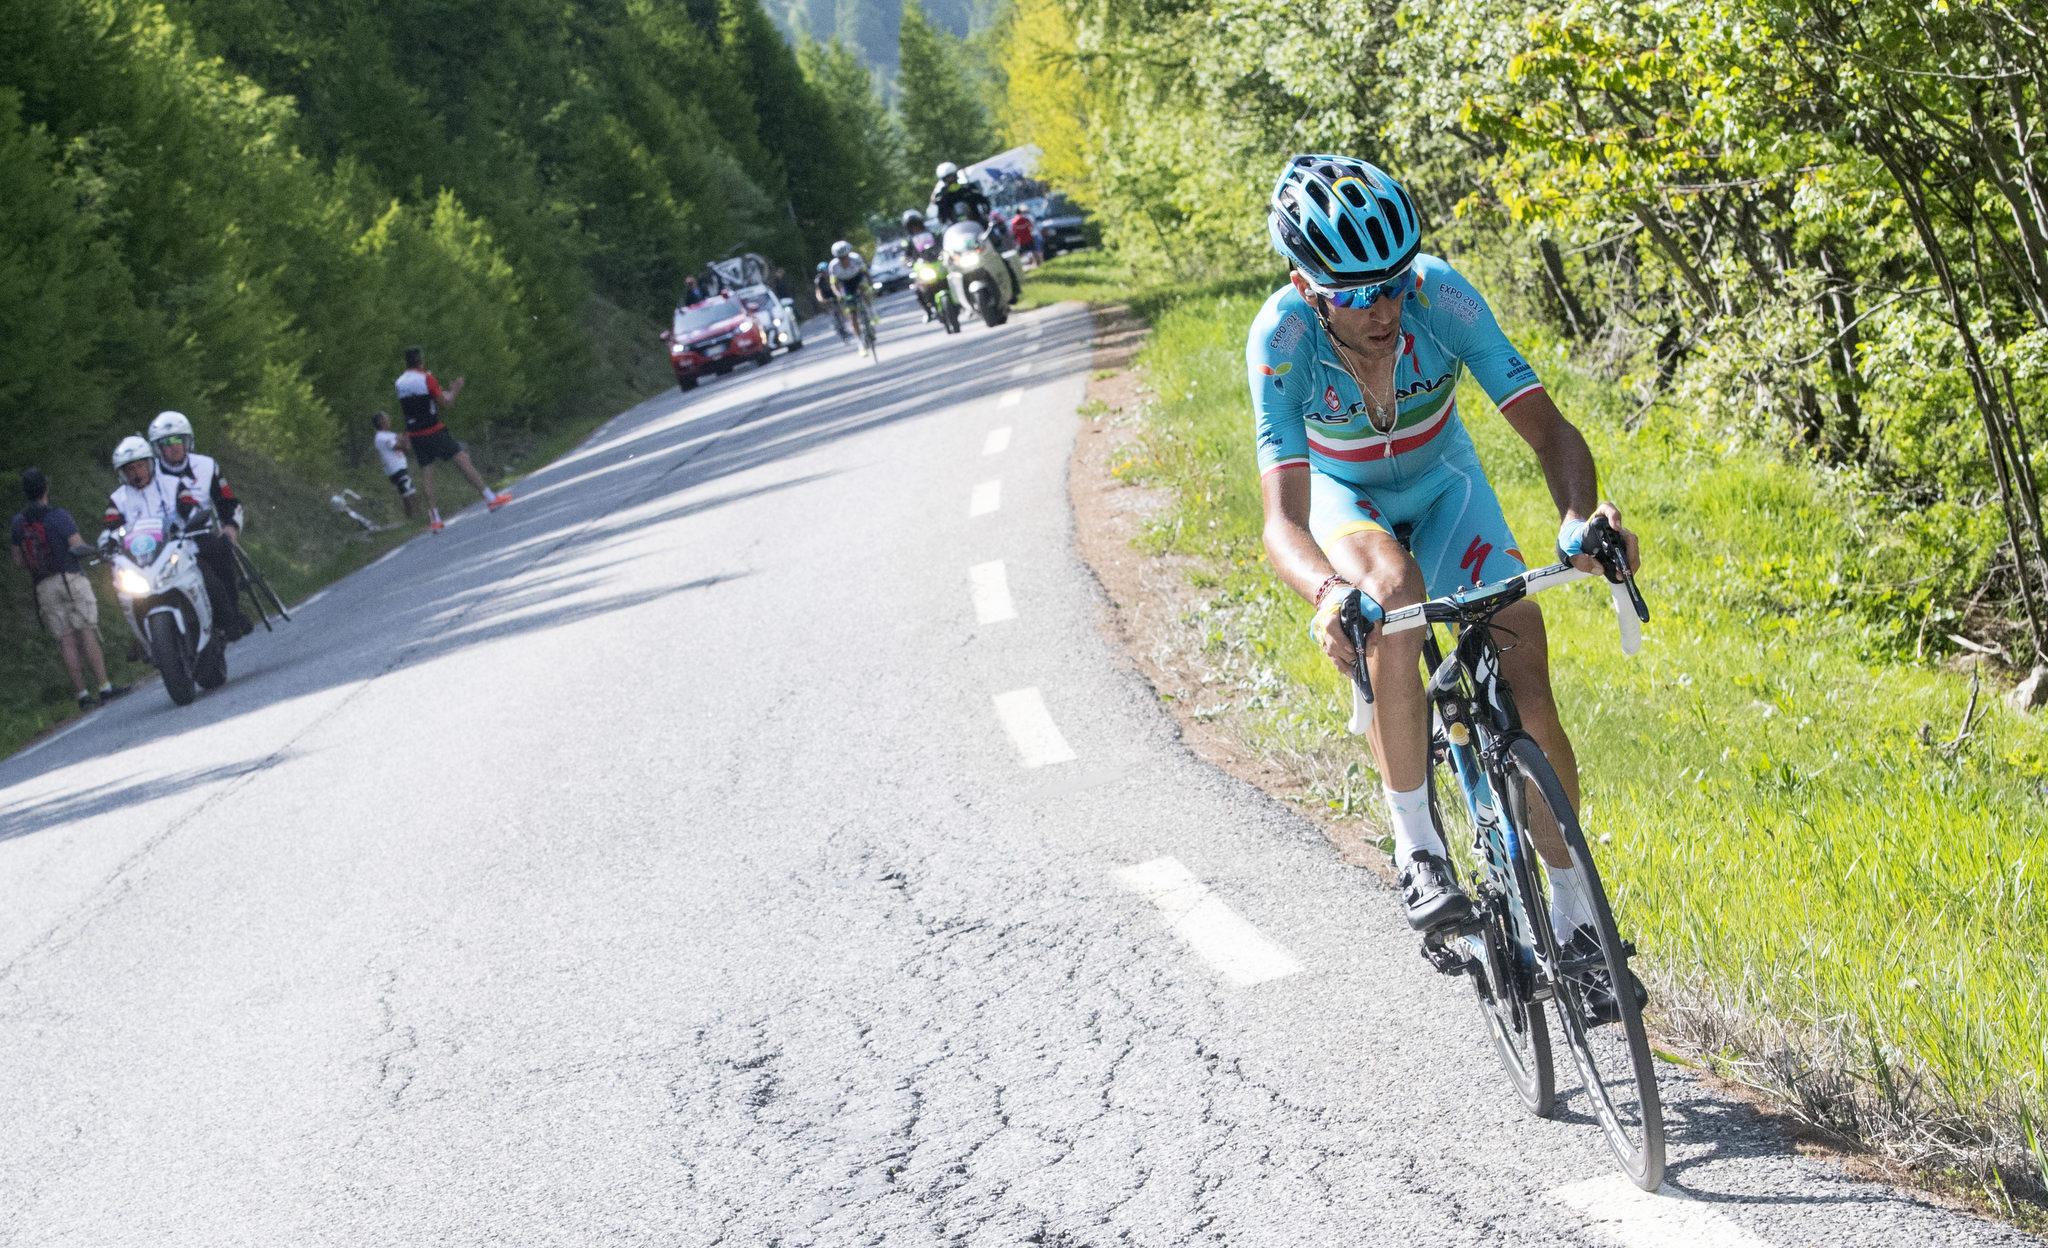 Nibali (Astana) headed to victory in Risoul. Photo by ANSA/CLAUDIO PERI